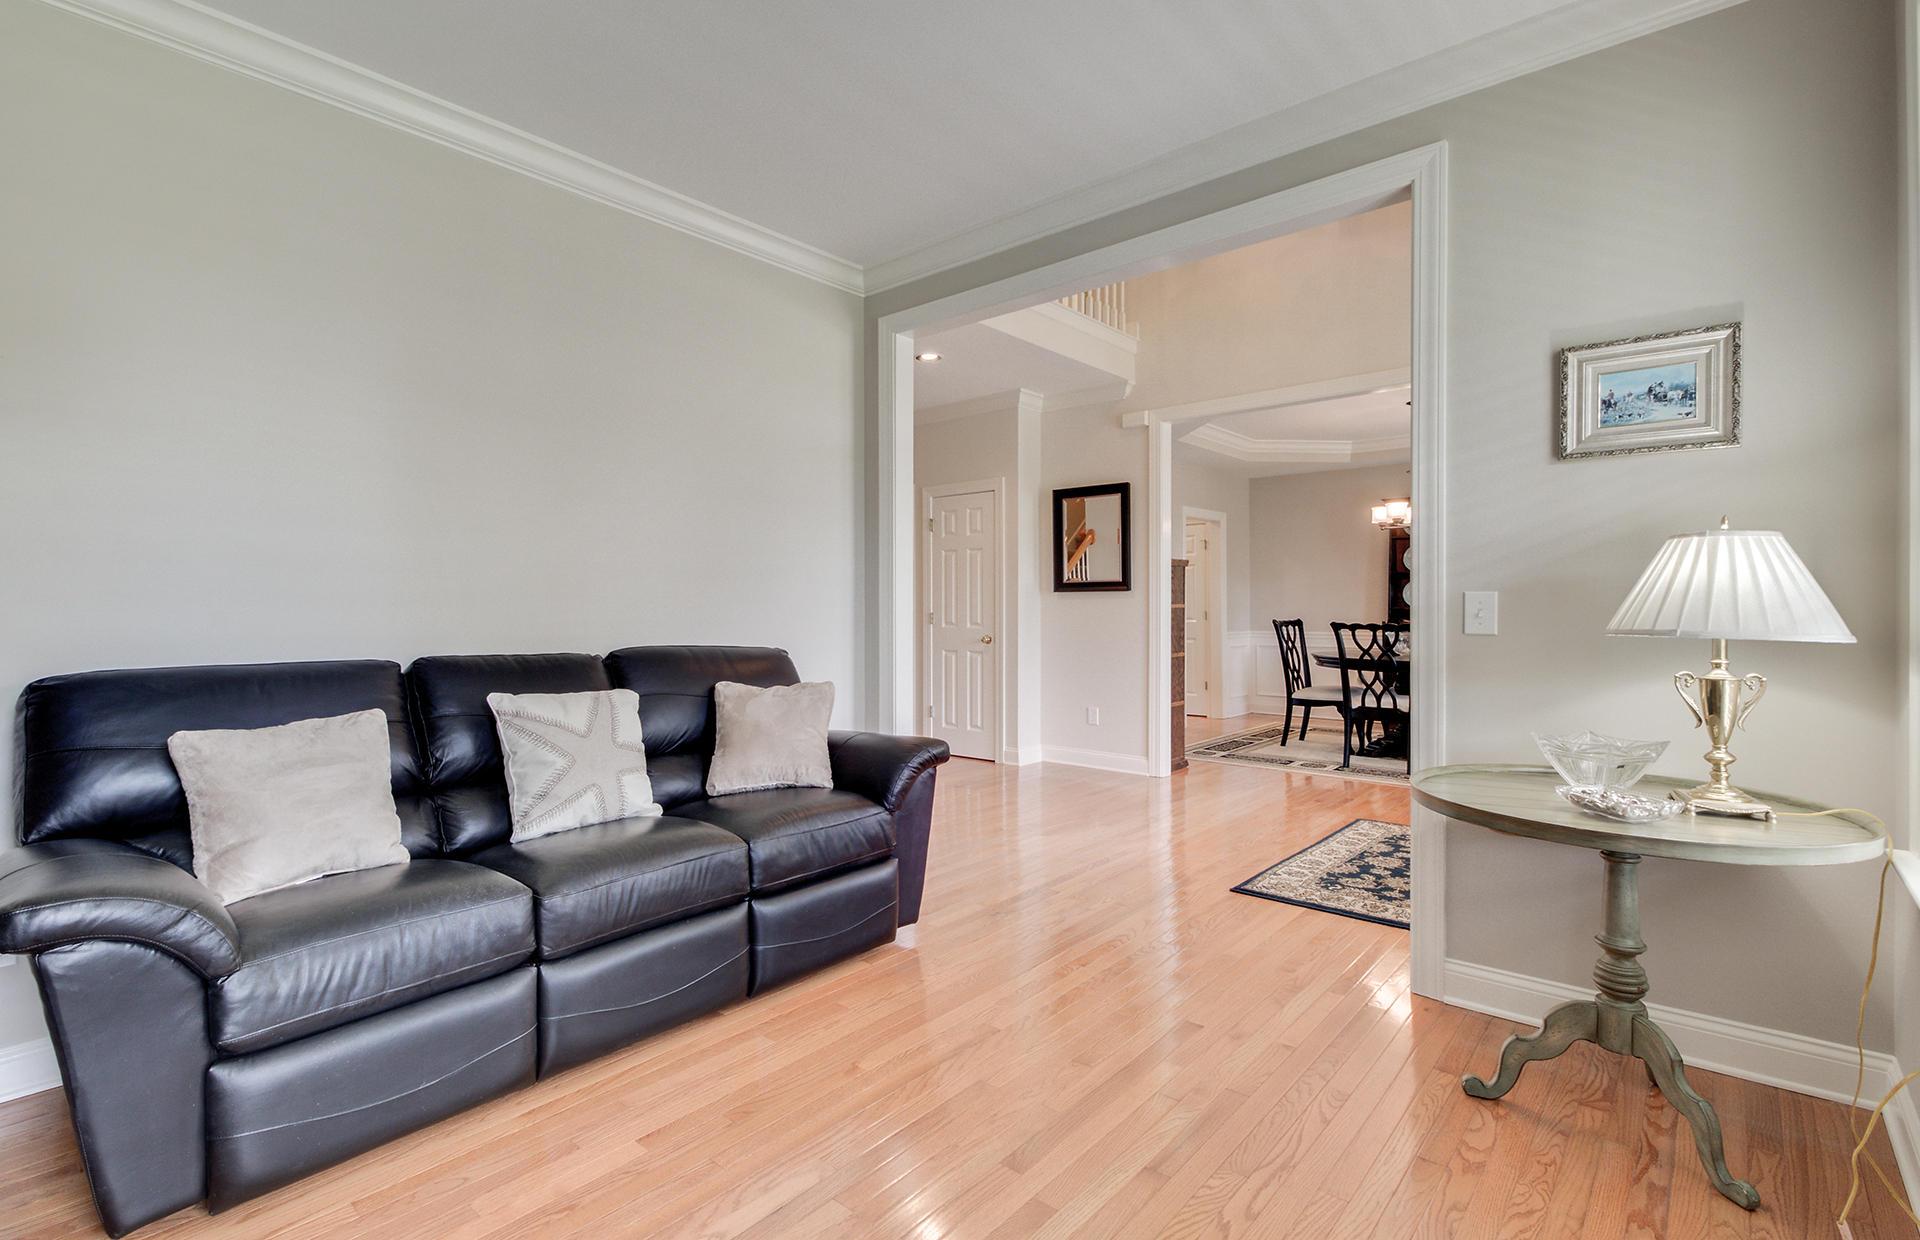 Dunes West Homes For Sale - 2453 Darts Cove, Mount Pleasant, SC - 37